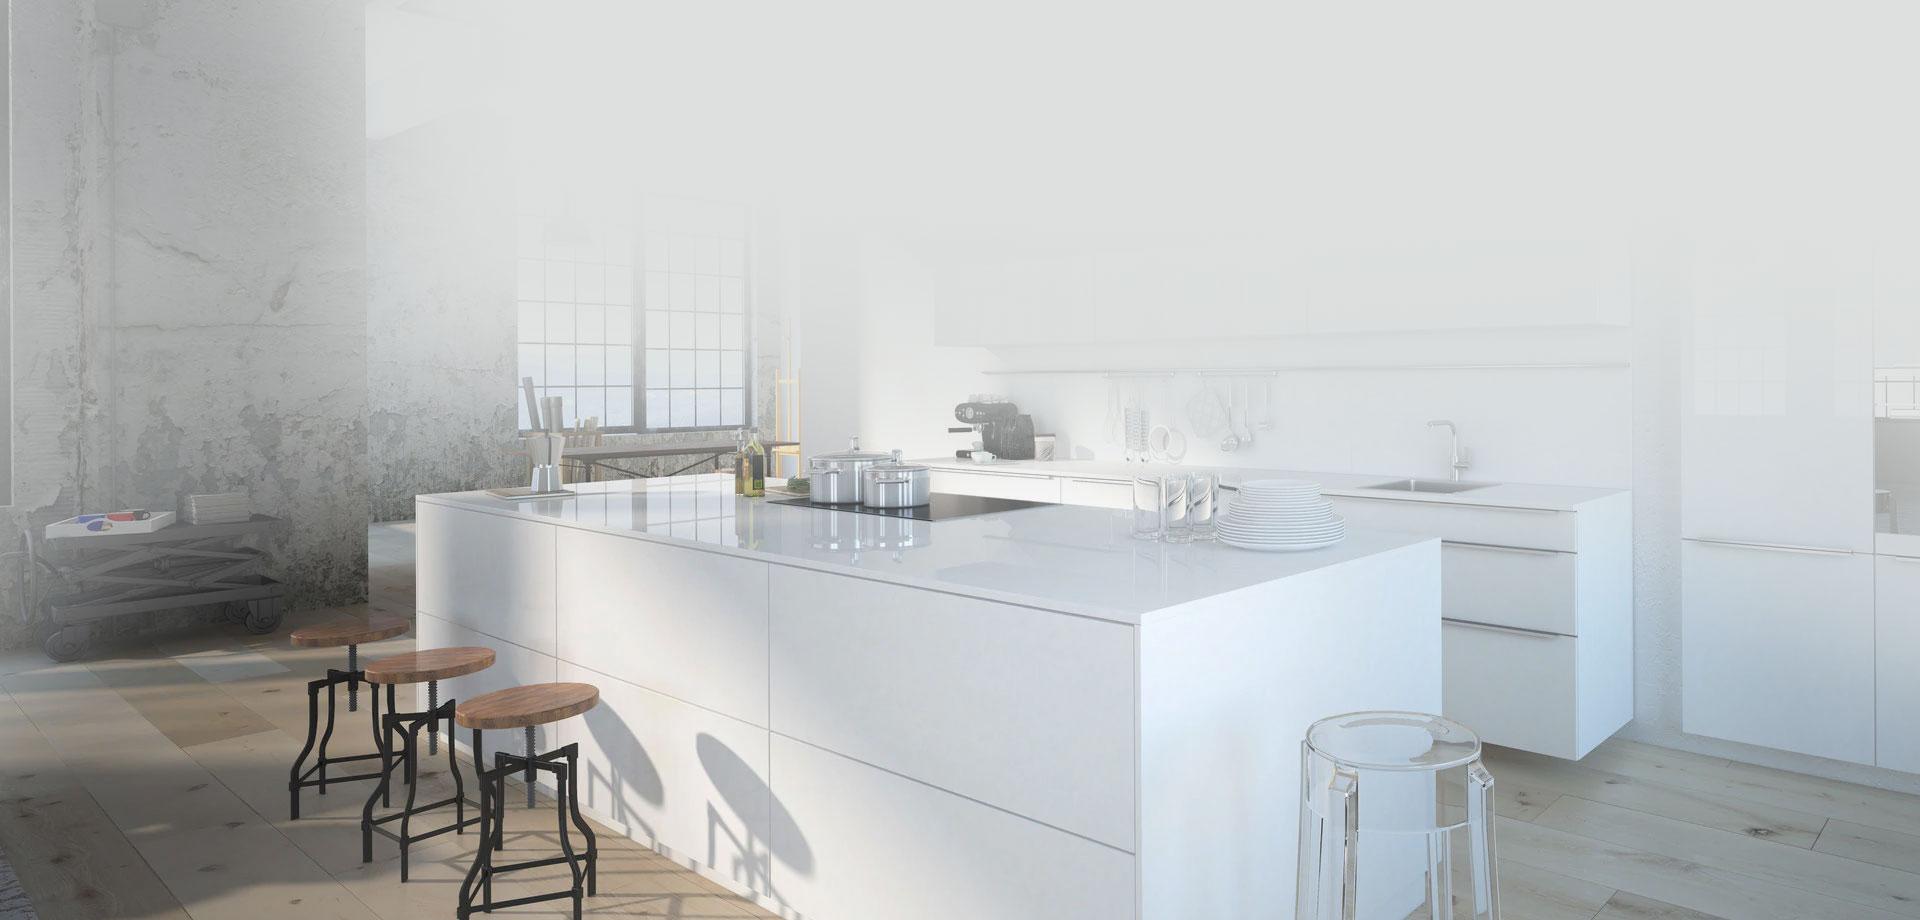 Les comptoirs de cuisines